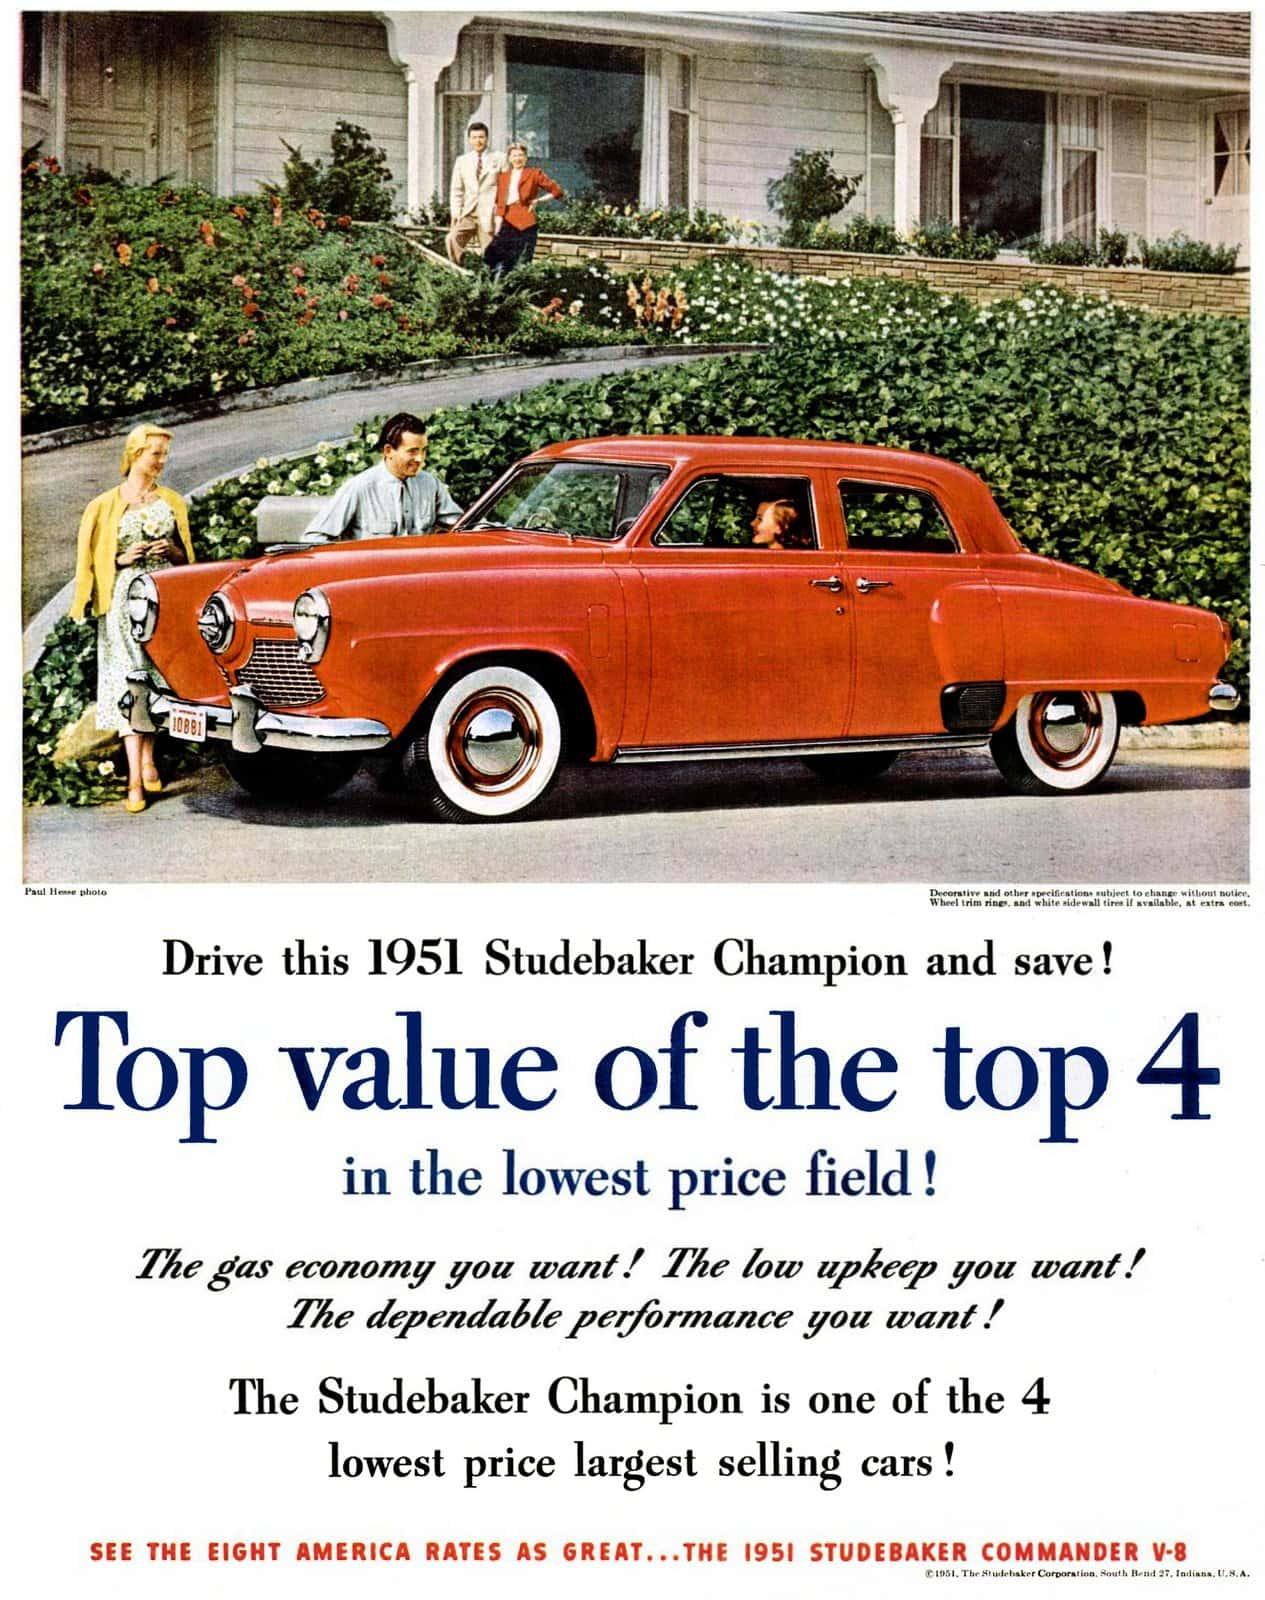 1951 Studebaker Champion - Classic cars